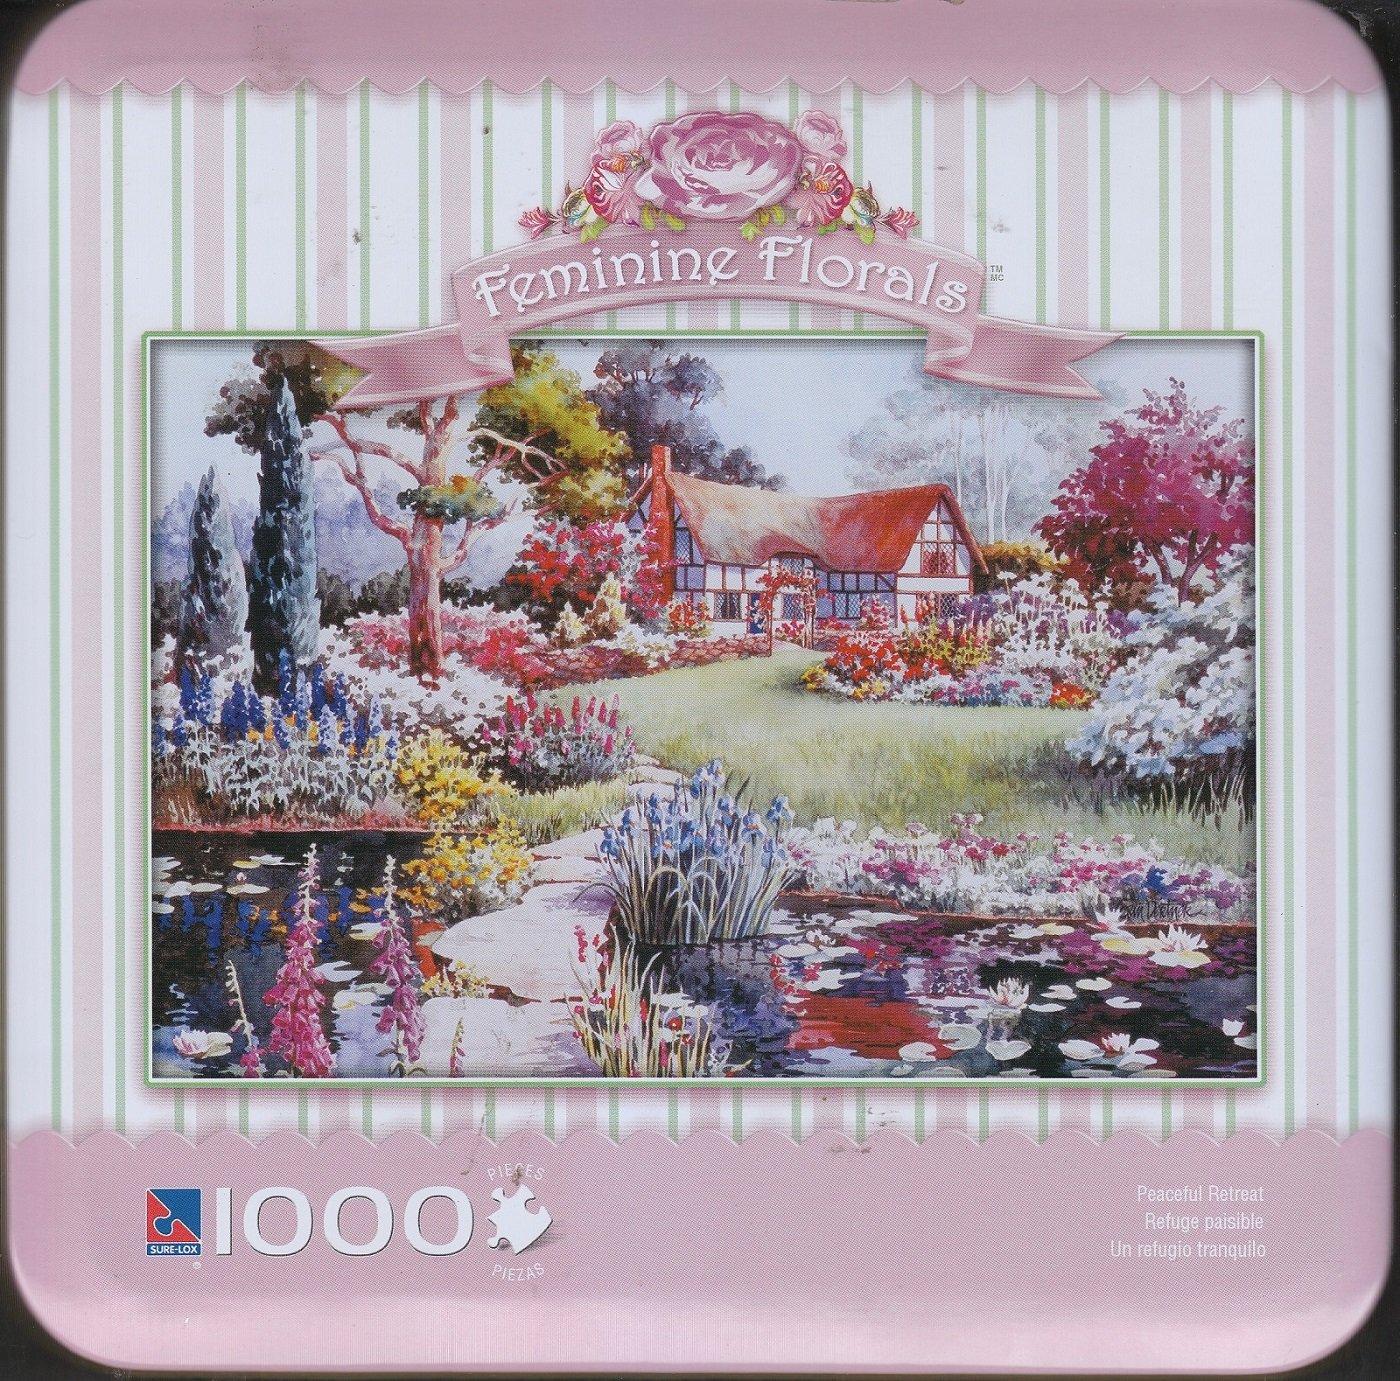 Feminine Florals Peaceful Retreat 1000 Piece Puzzle in Storage Tin